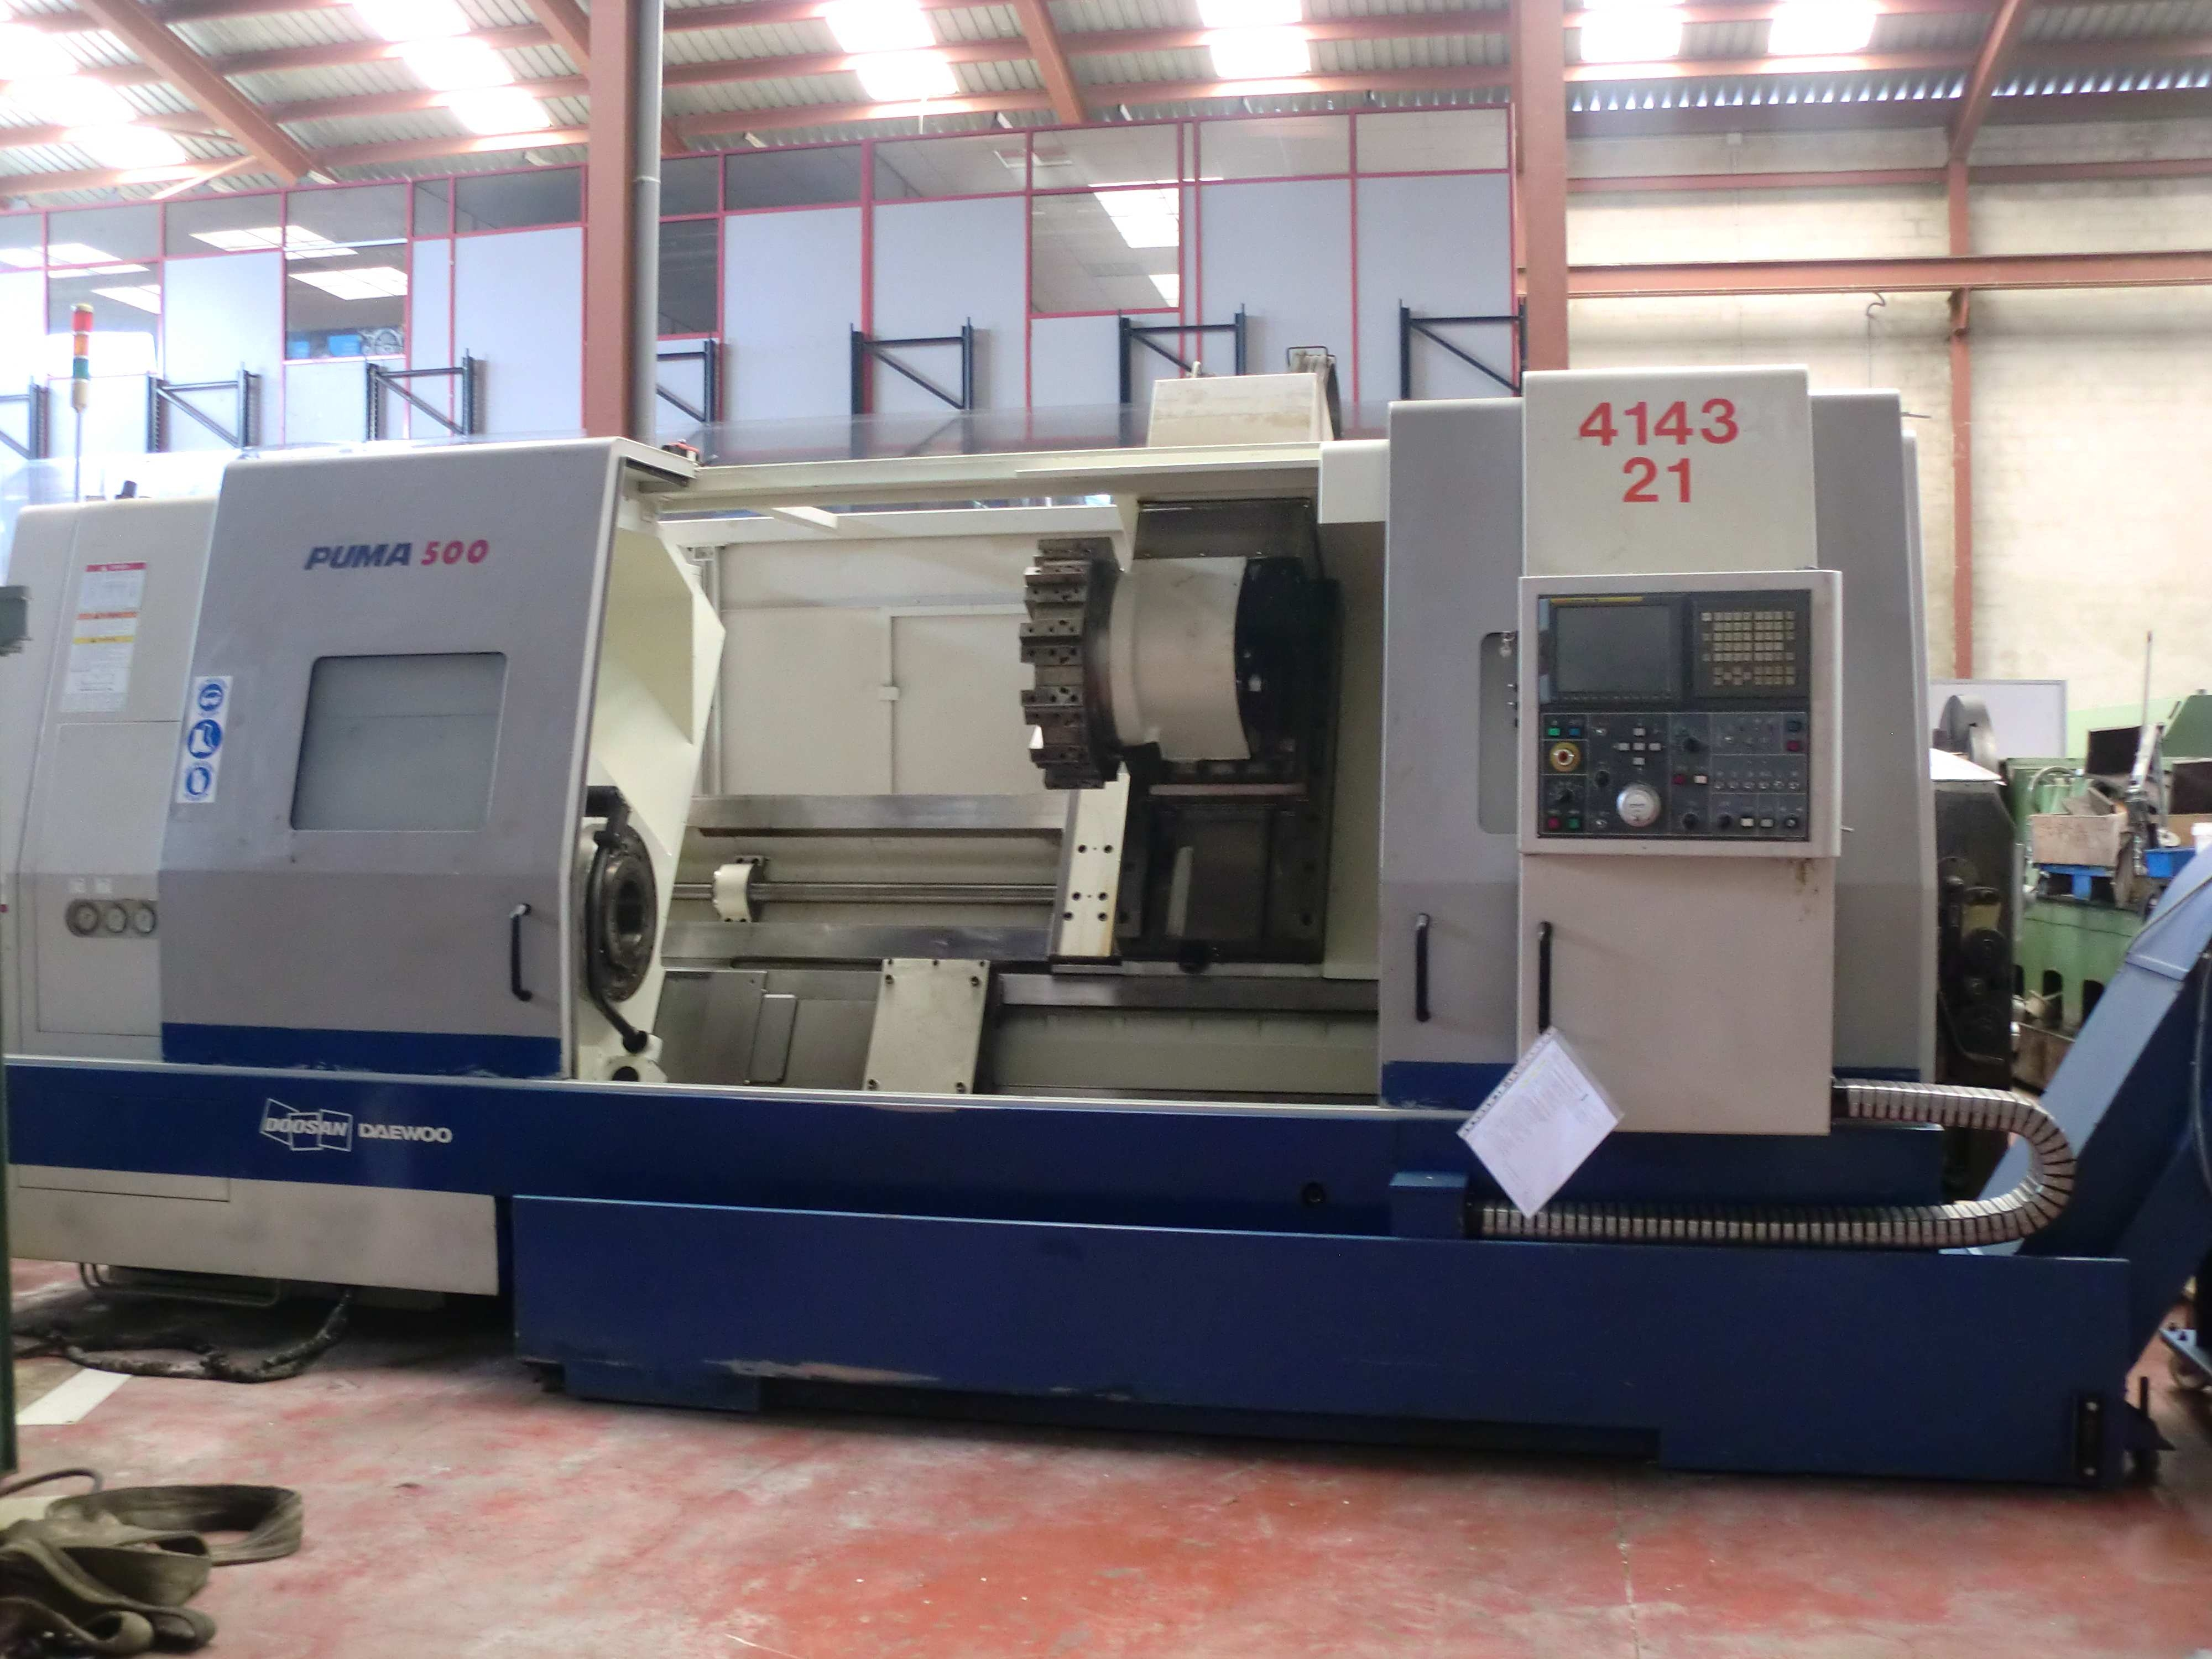 nouveaux styles eb955 2f89e LATHE DOOSAN PUMA 500 CNC - FERROTALL